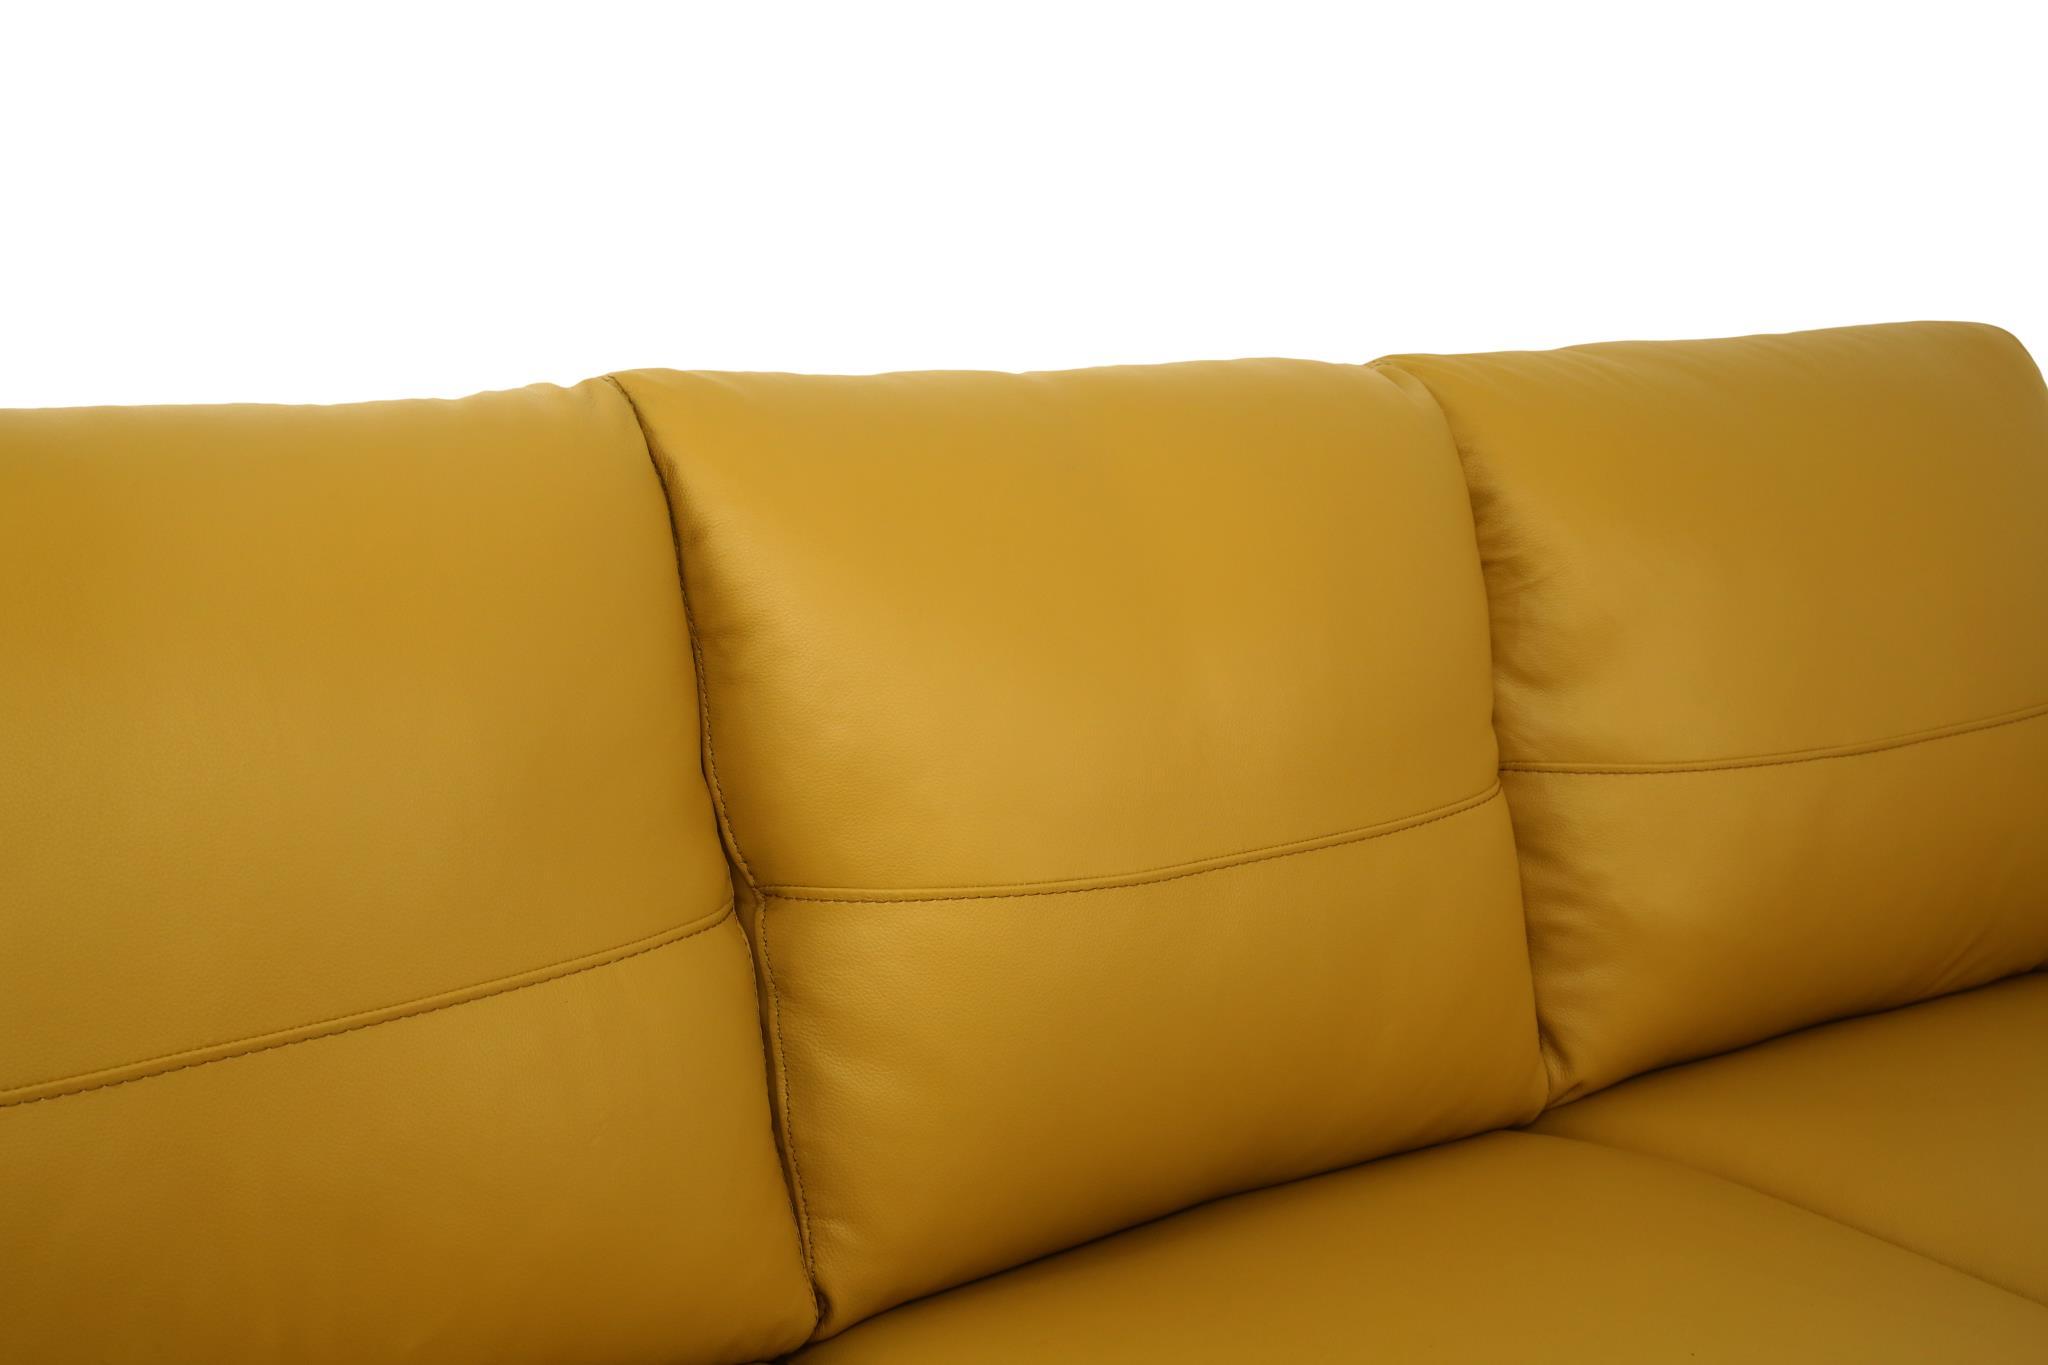 Mustard Sofa Cushions